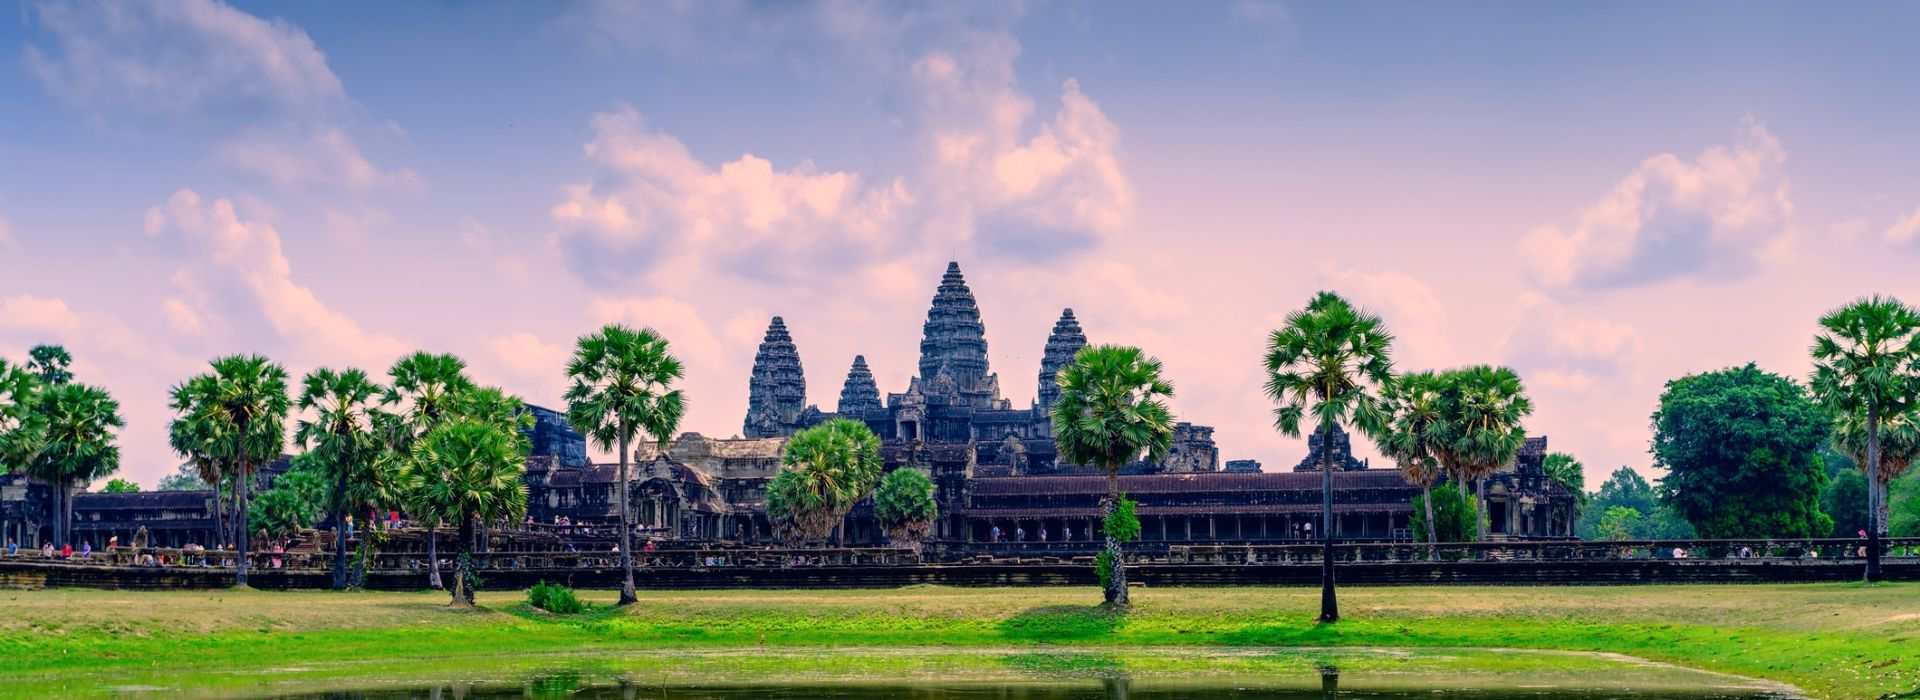 War sites Tours in Cambodia